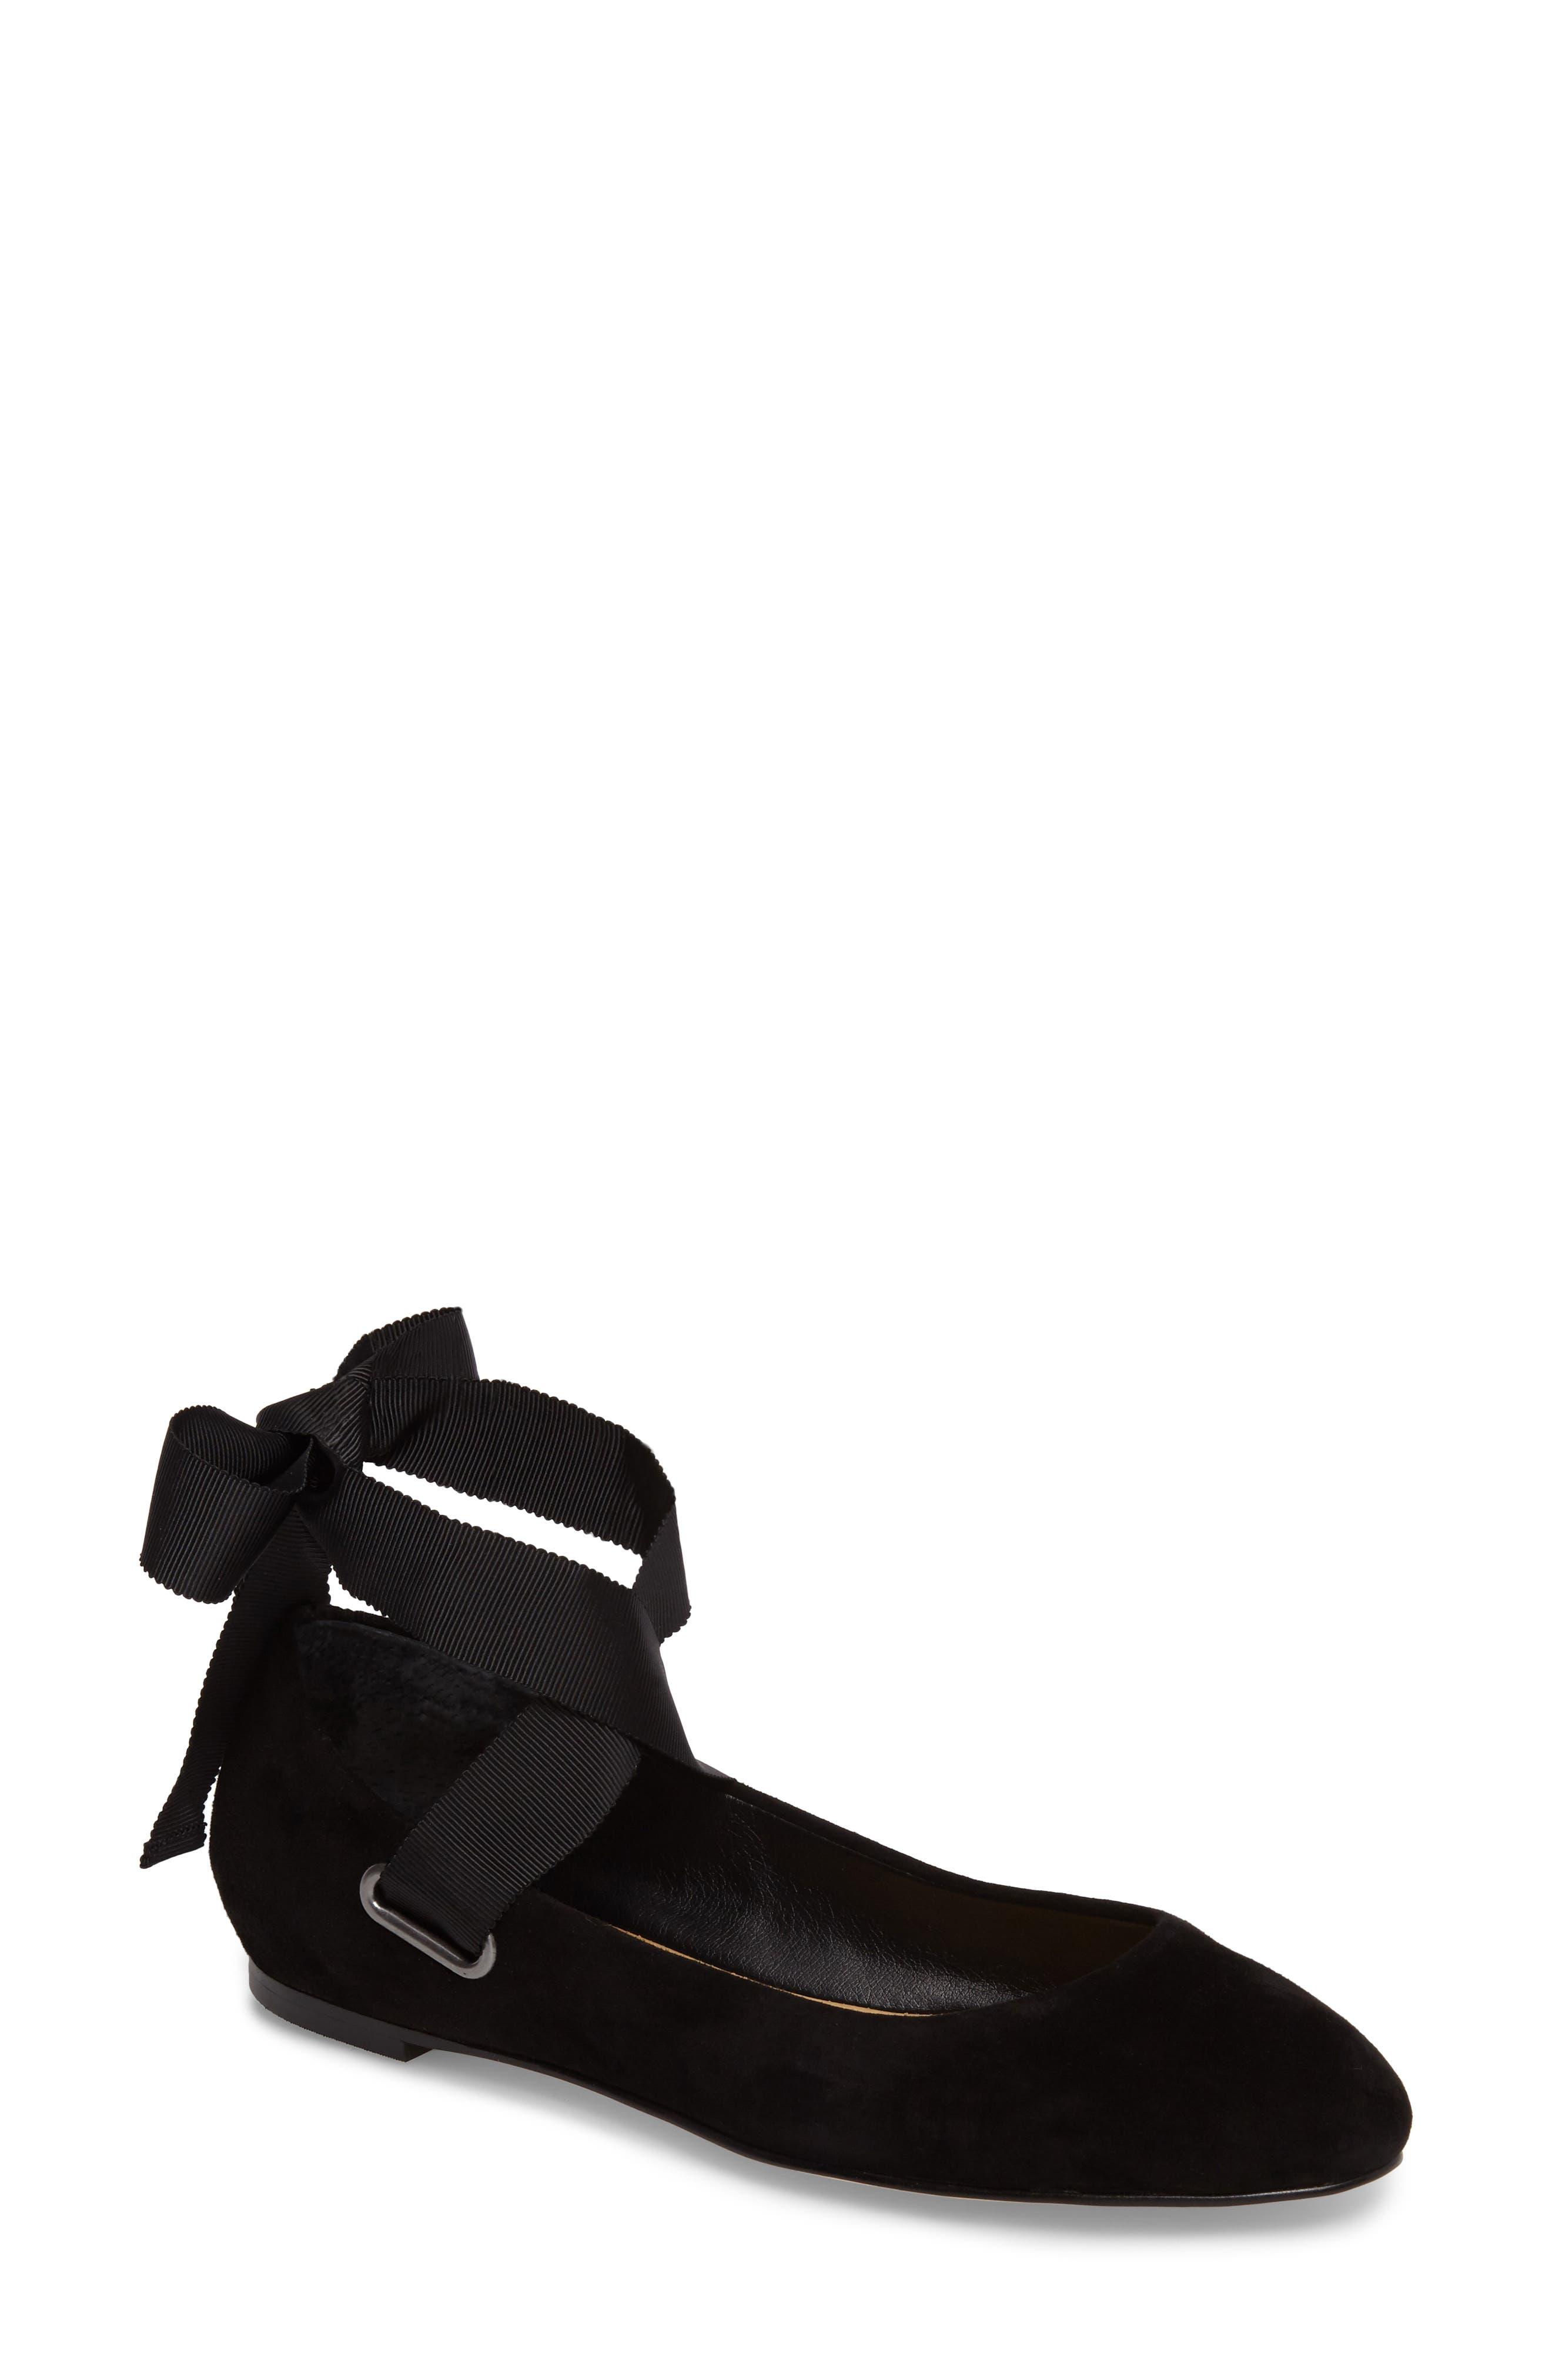 SPLENDID,                             Renee Ankle Tie Flat,                             Main thumbnail 1, color,                             013